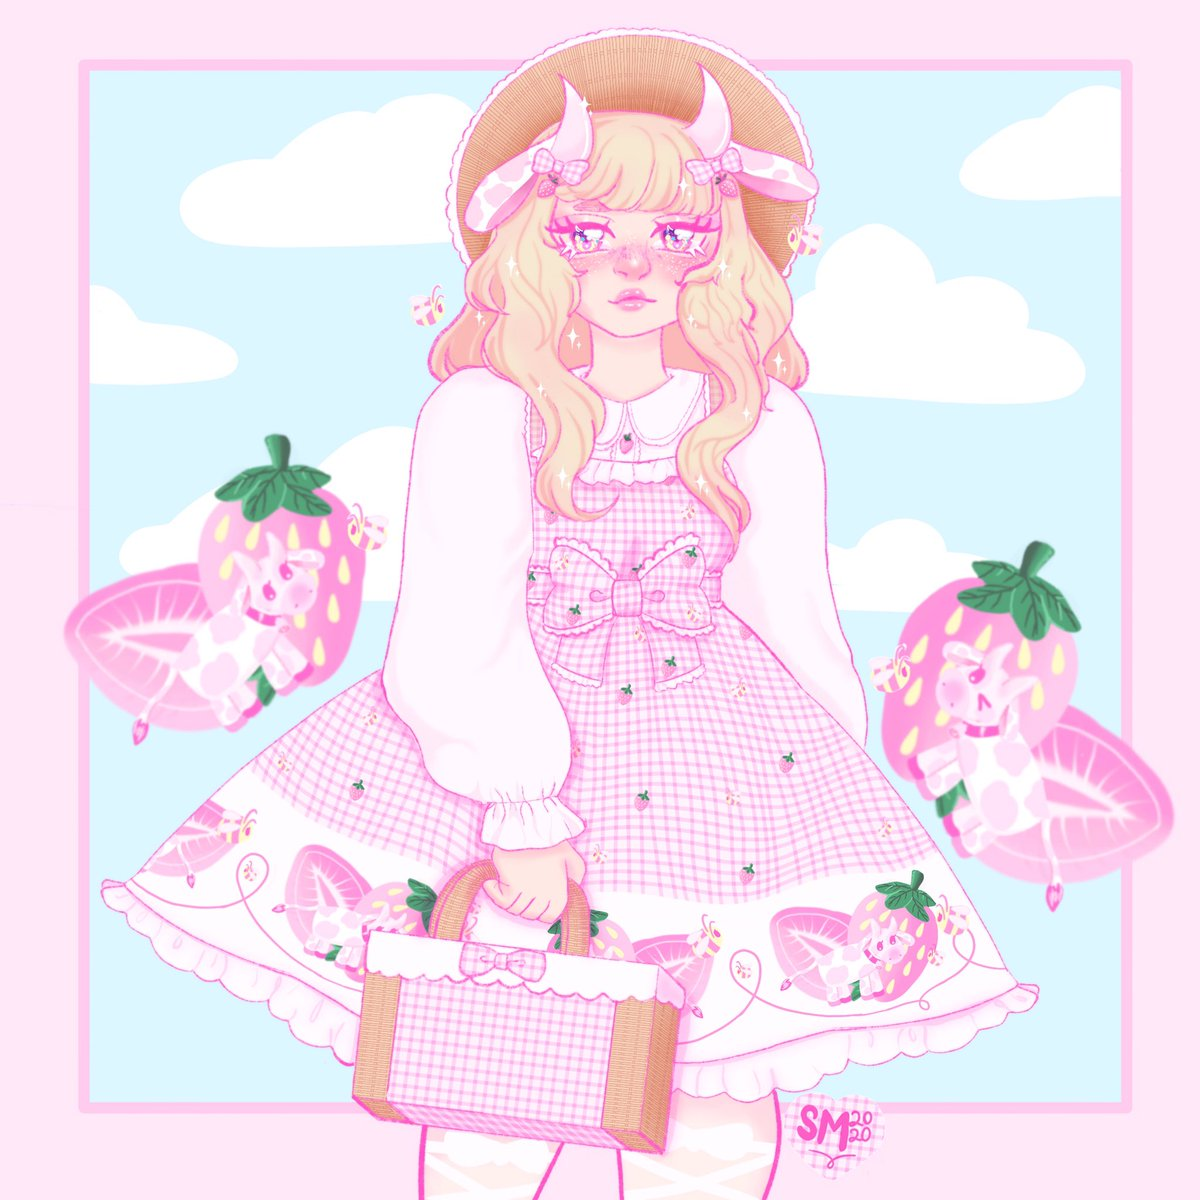 Strawberry cow country lolita , #kawaii #strawberry #strawberrycow #countrylolita #pink #gingham #egl #sweetlolita #pastel #digitalart #illustration @procreate #kawaiiart  #procreate  #ottsweet #pastelaesthetic #myart #pink #blue  #illustrator #uwu #prettypic.twitter.com/48YEXzgwdy